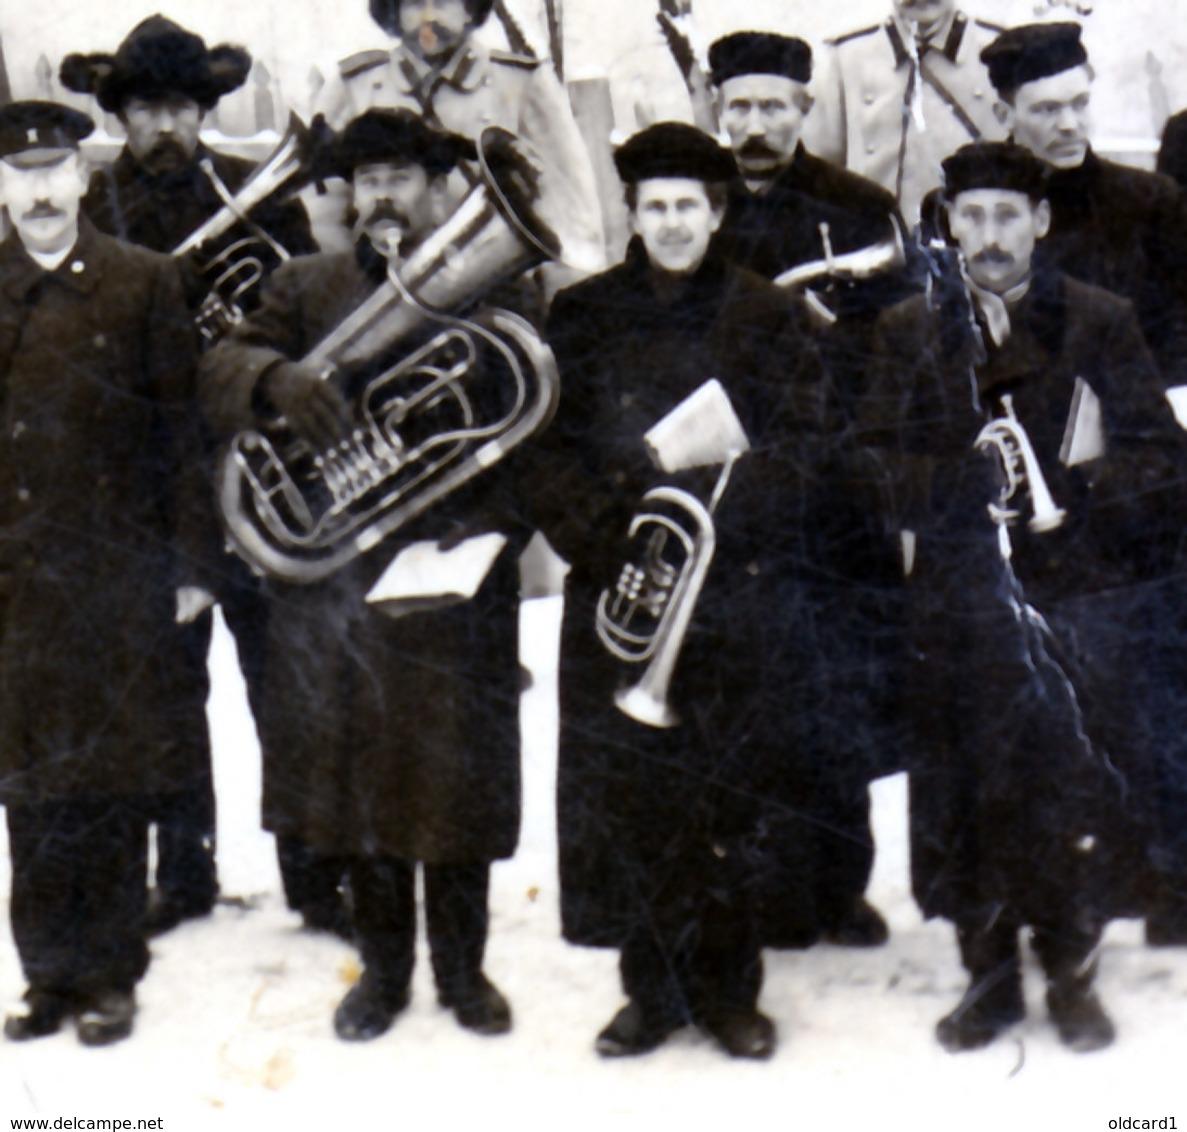 ESTONIA NUSTAGO JURJEW DORPAT TARTU 05.12.1907 Firefighters, Police Officers, ORCHESTRA ... - Estonia